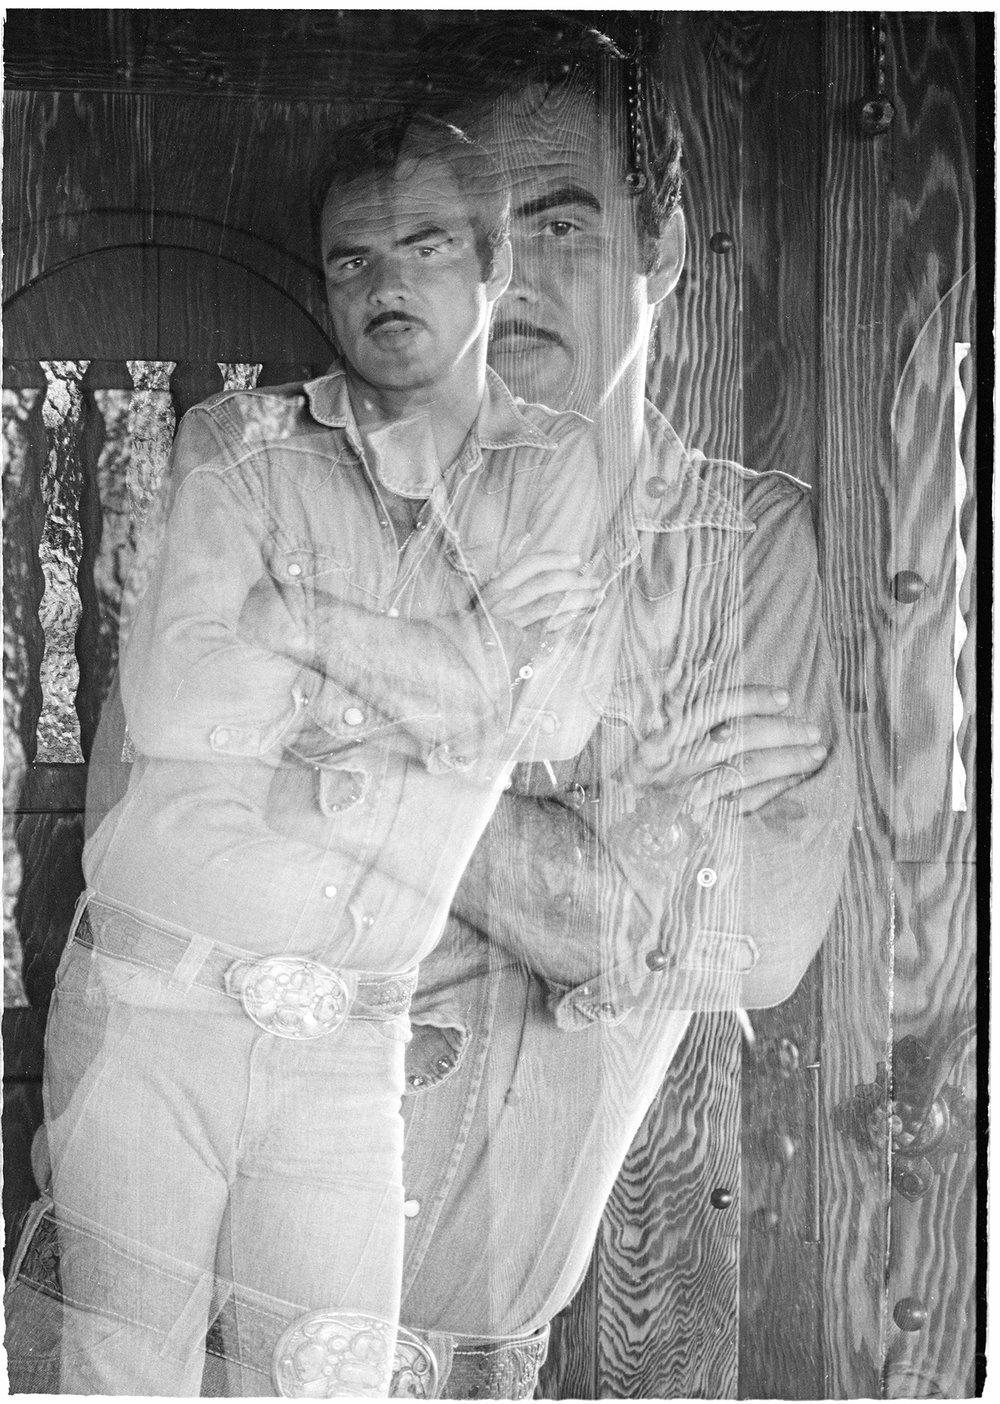 Image of Burt Reynolds Double Exposure